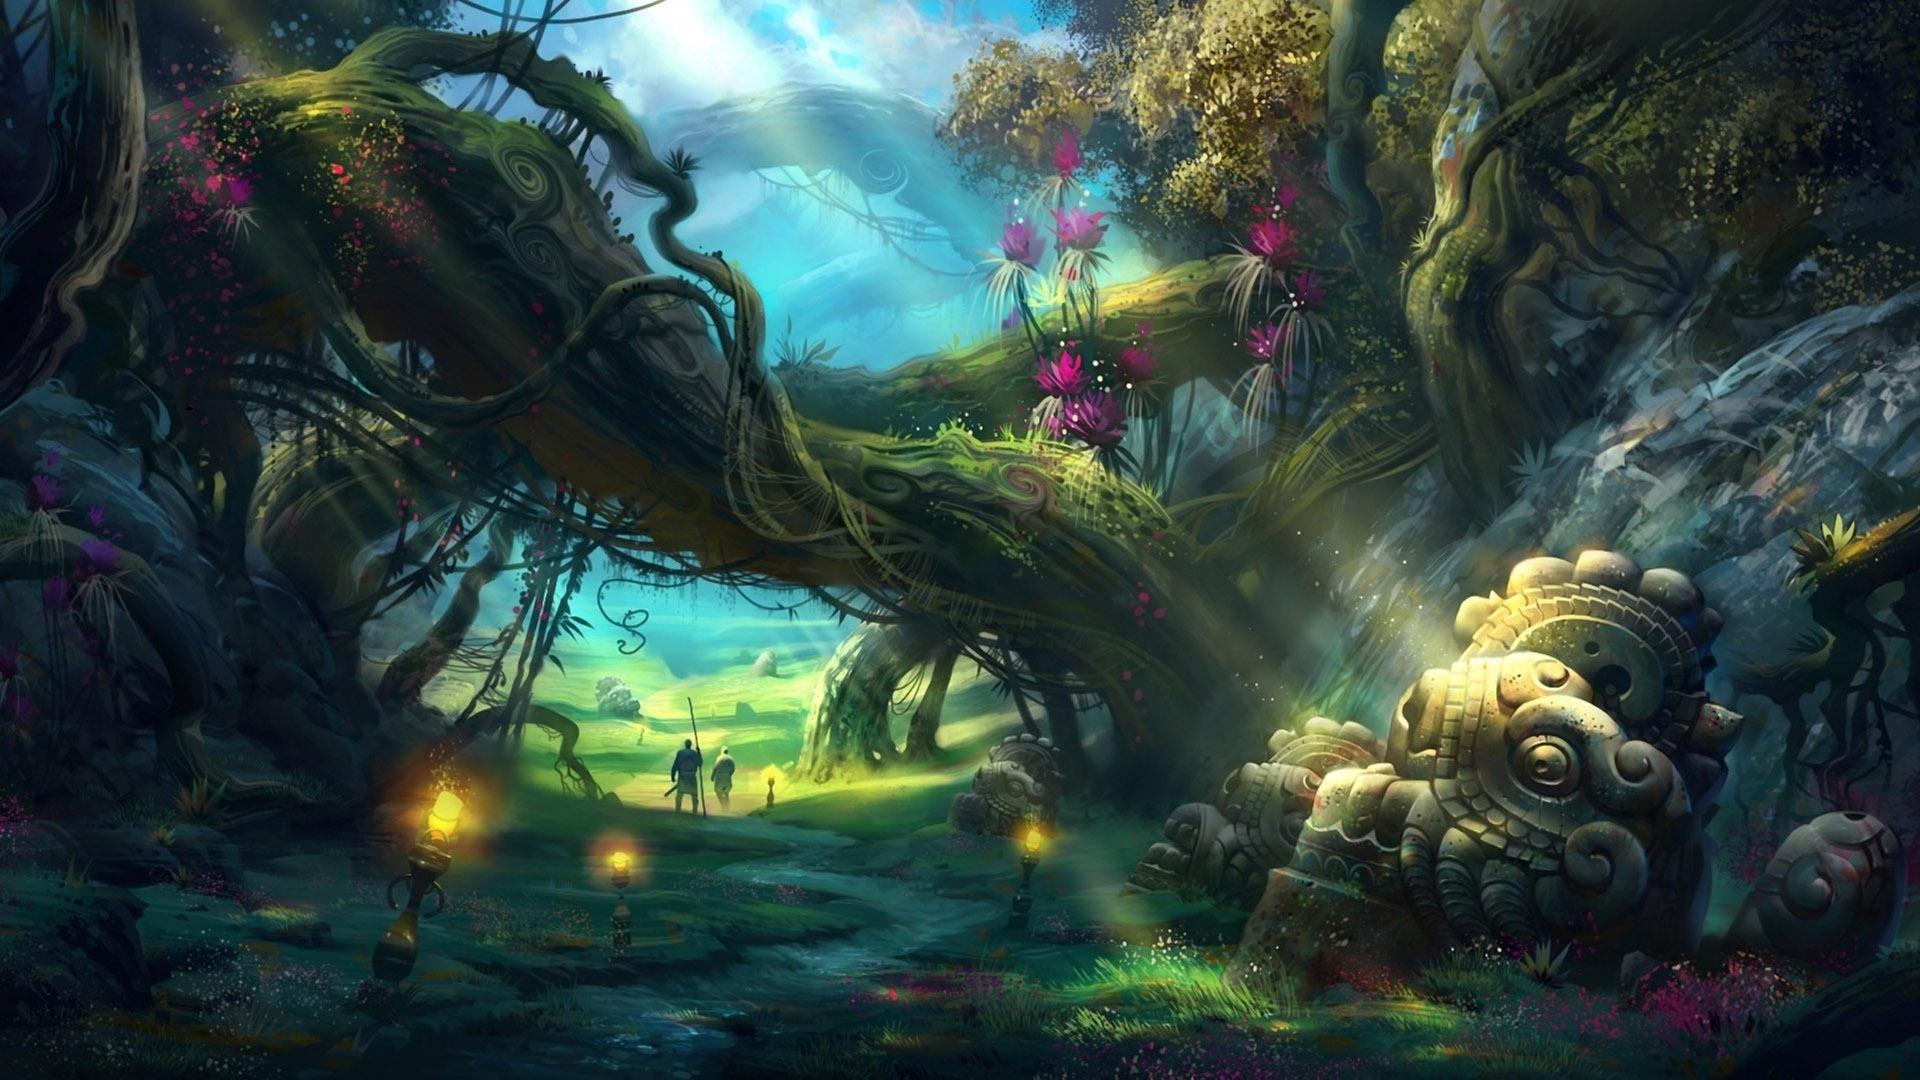 Fantasy clipart enchanted tree Wallpaper Adventures Wallpaper THIS Widescreen